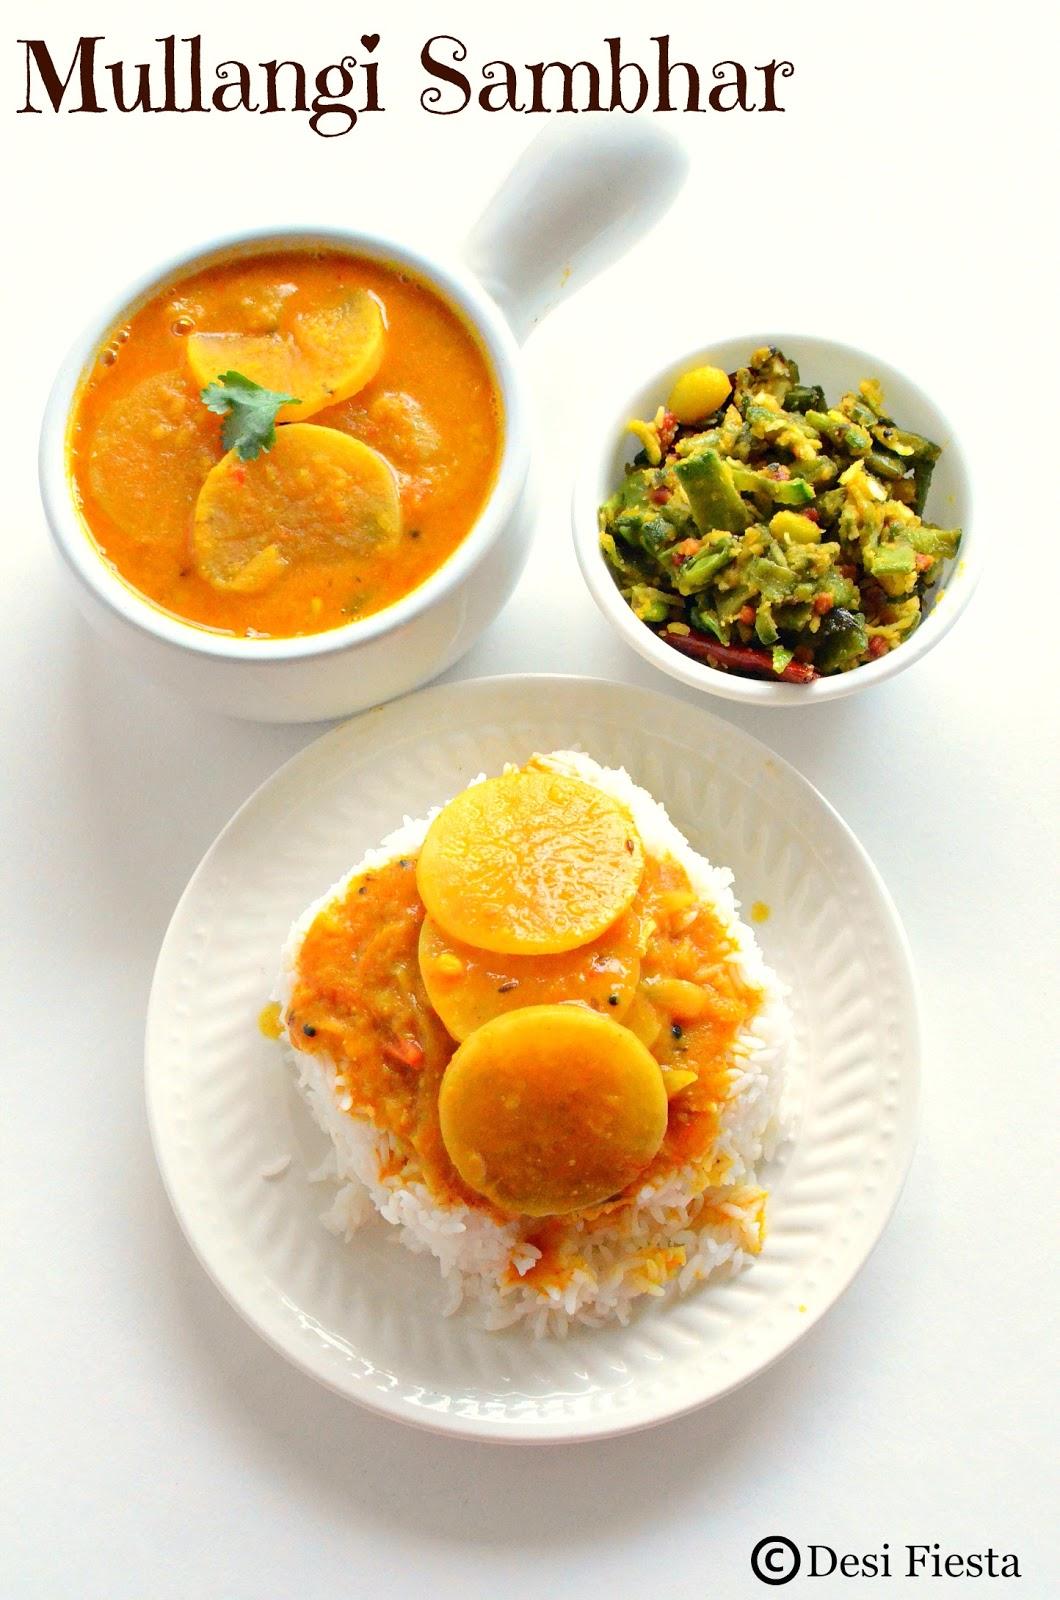 How to make sambhar Recipe?